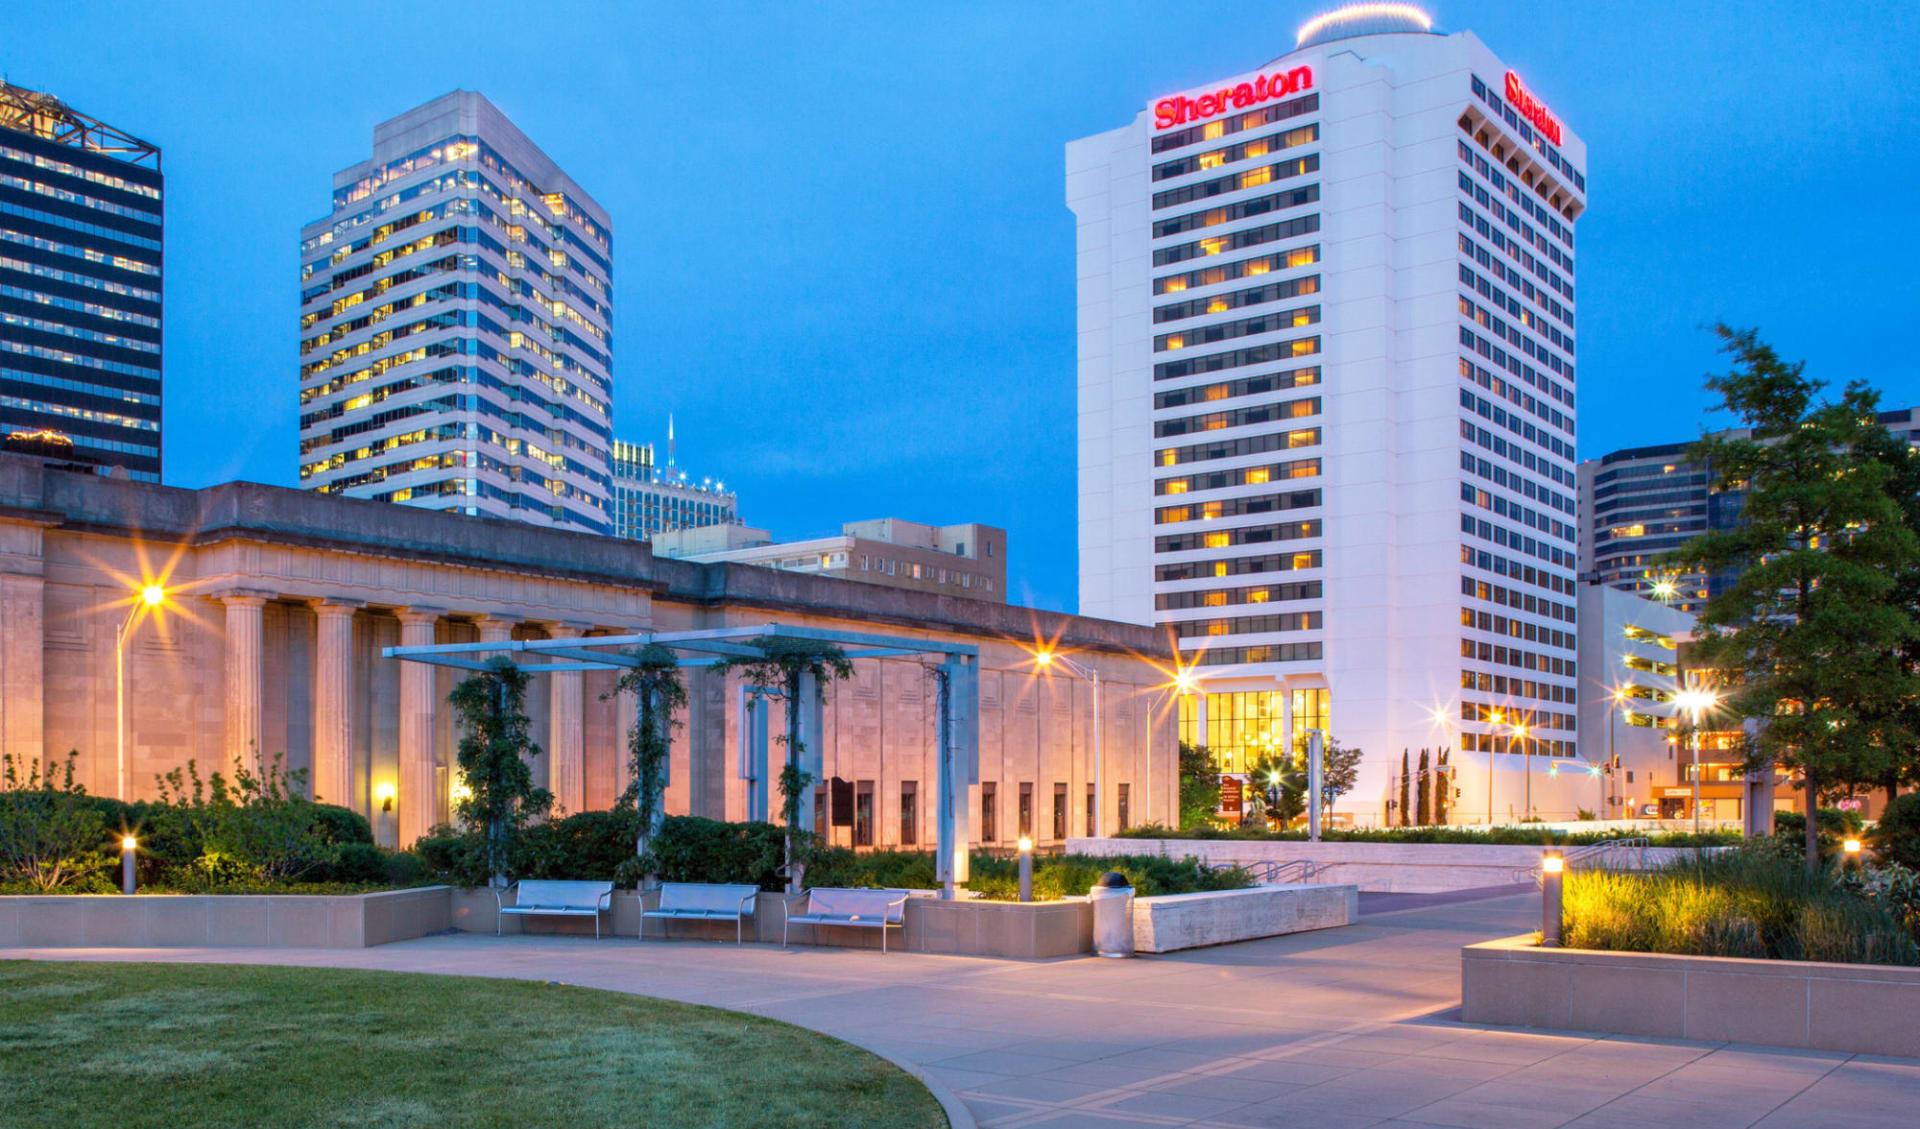 Sheraton Nashville Downtown:  Sheraton Nashville Downtown - Aussenansicht